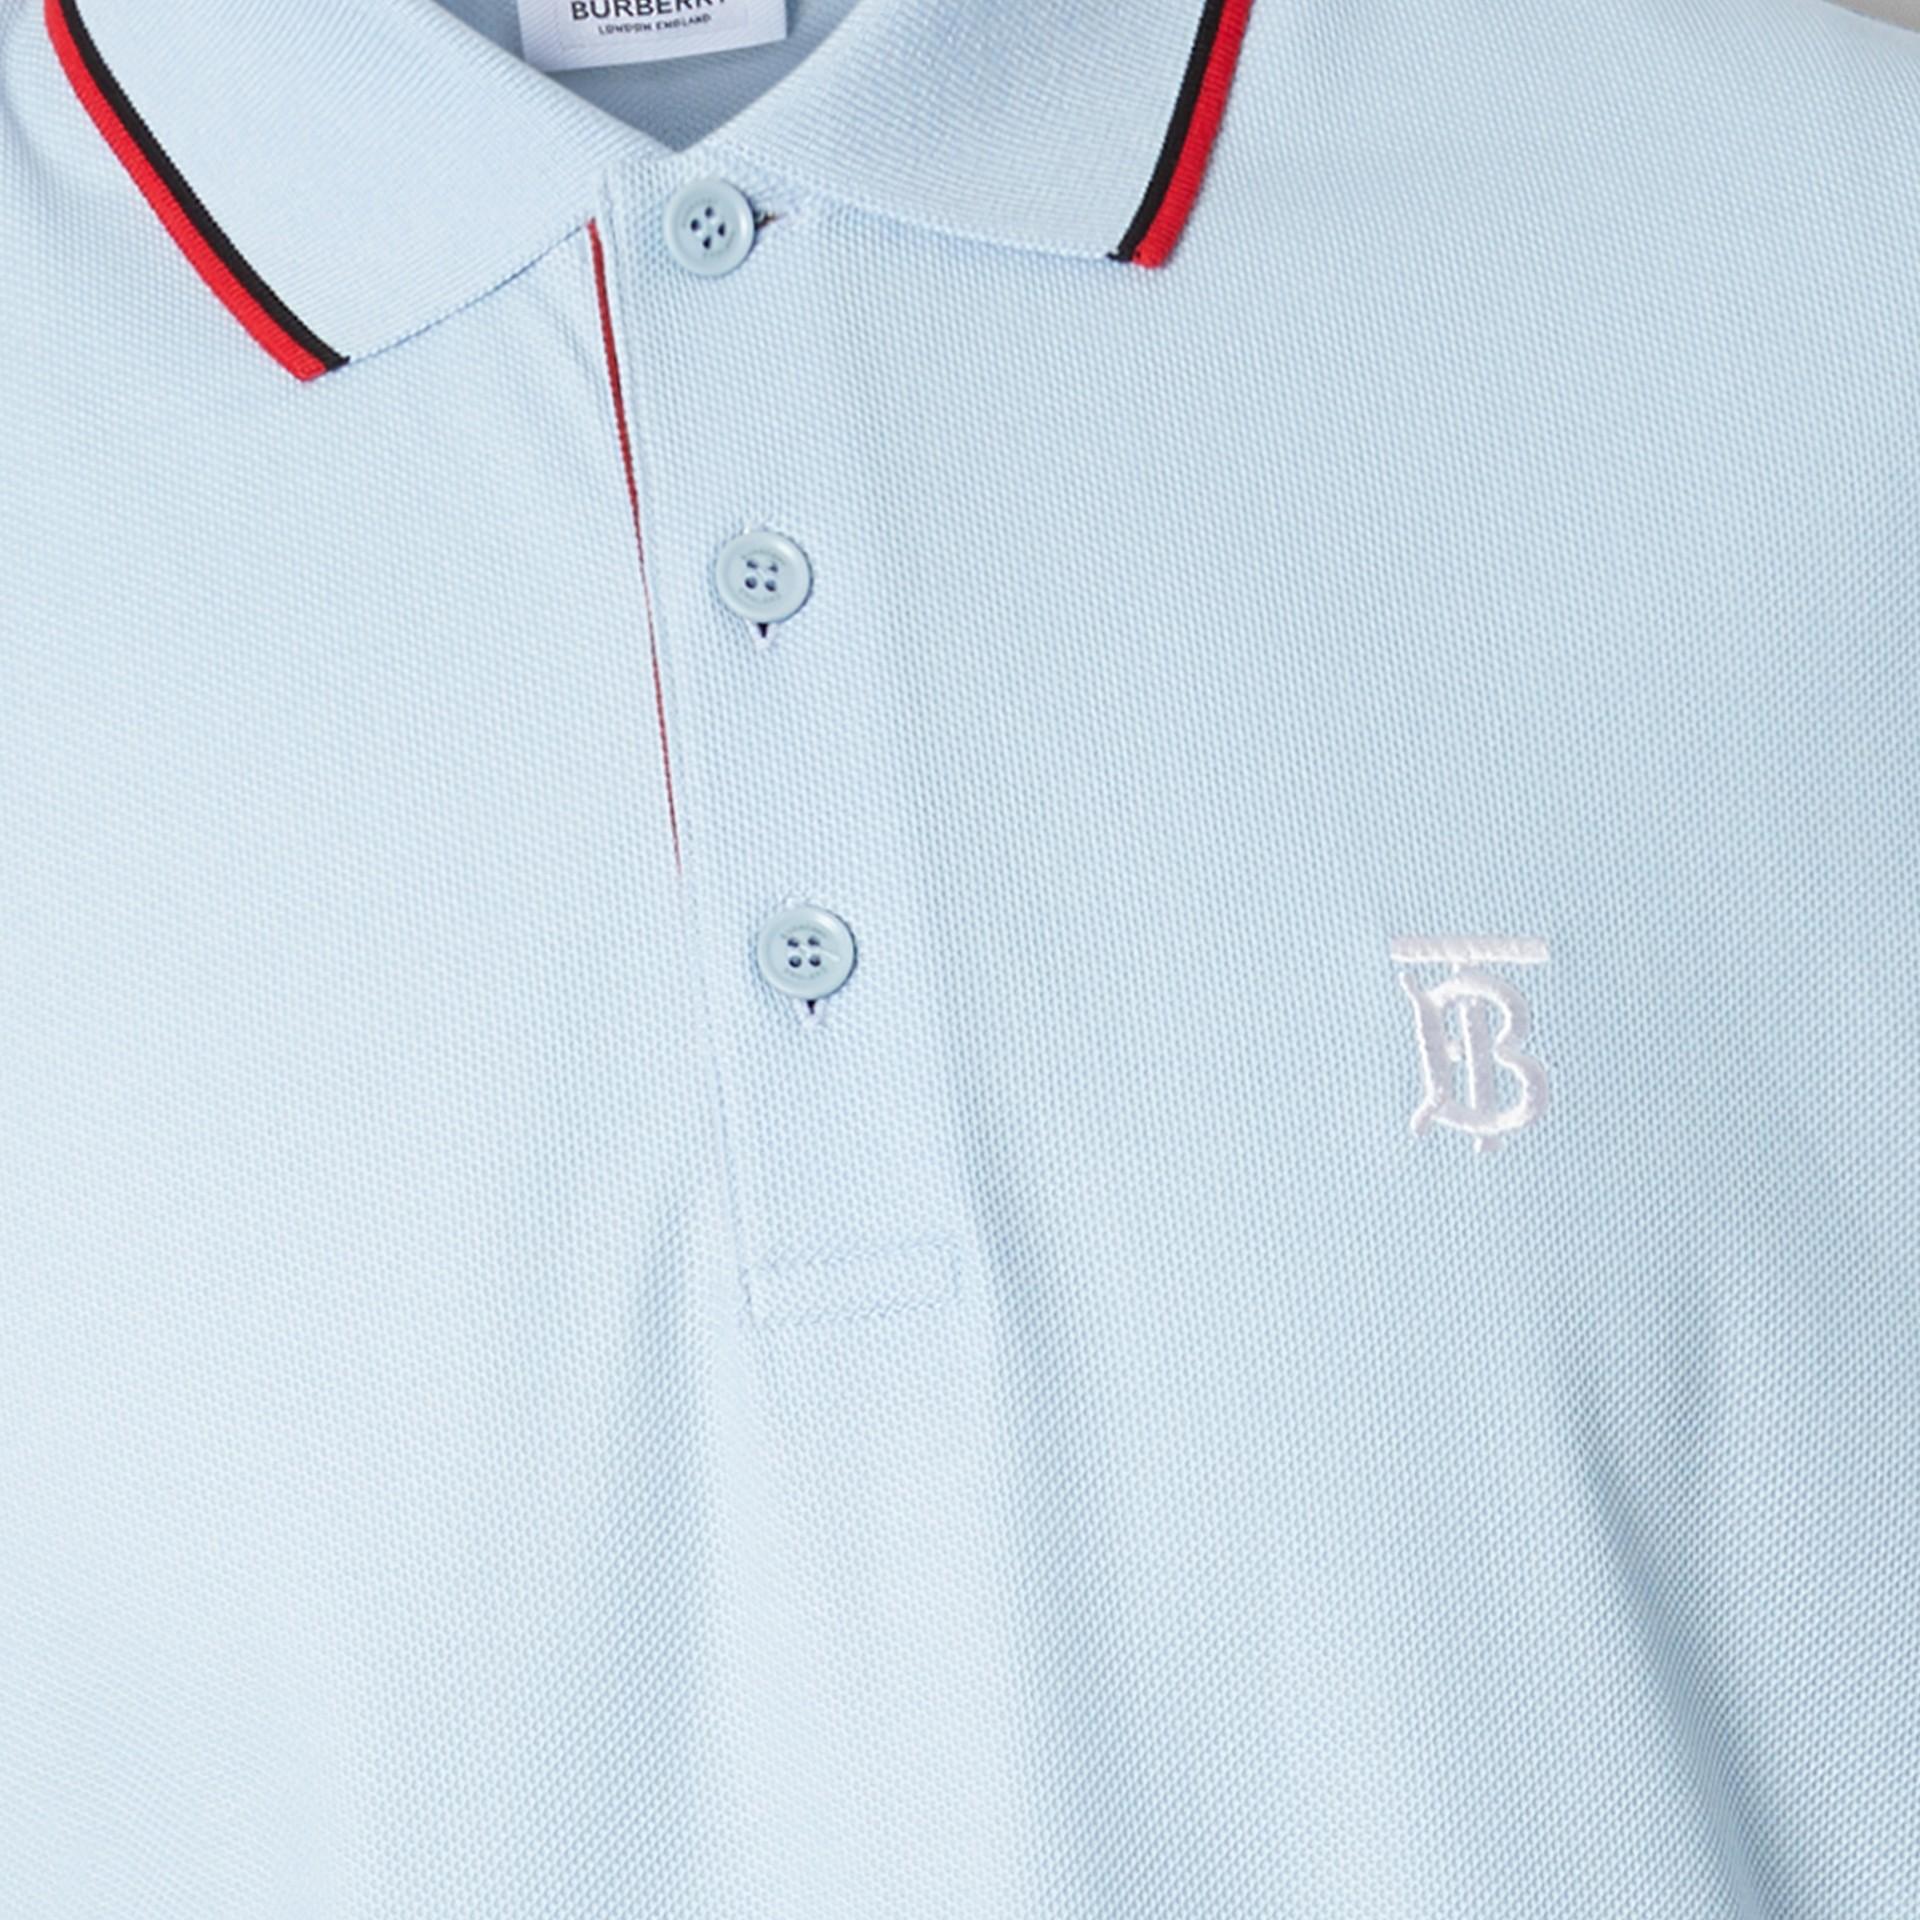 Long-sleeve Monogram Motif Cotton Piqué Polo Shirt in Pale Blue - Men | Burberry - gallery image 1